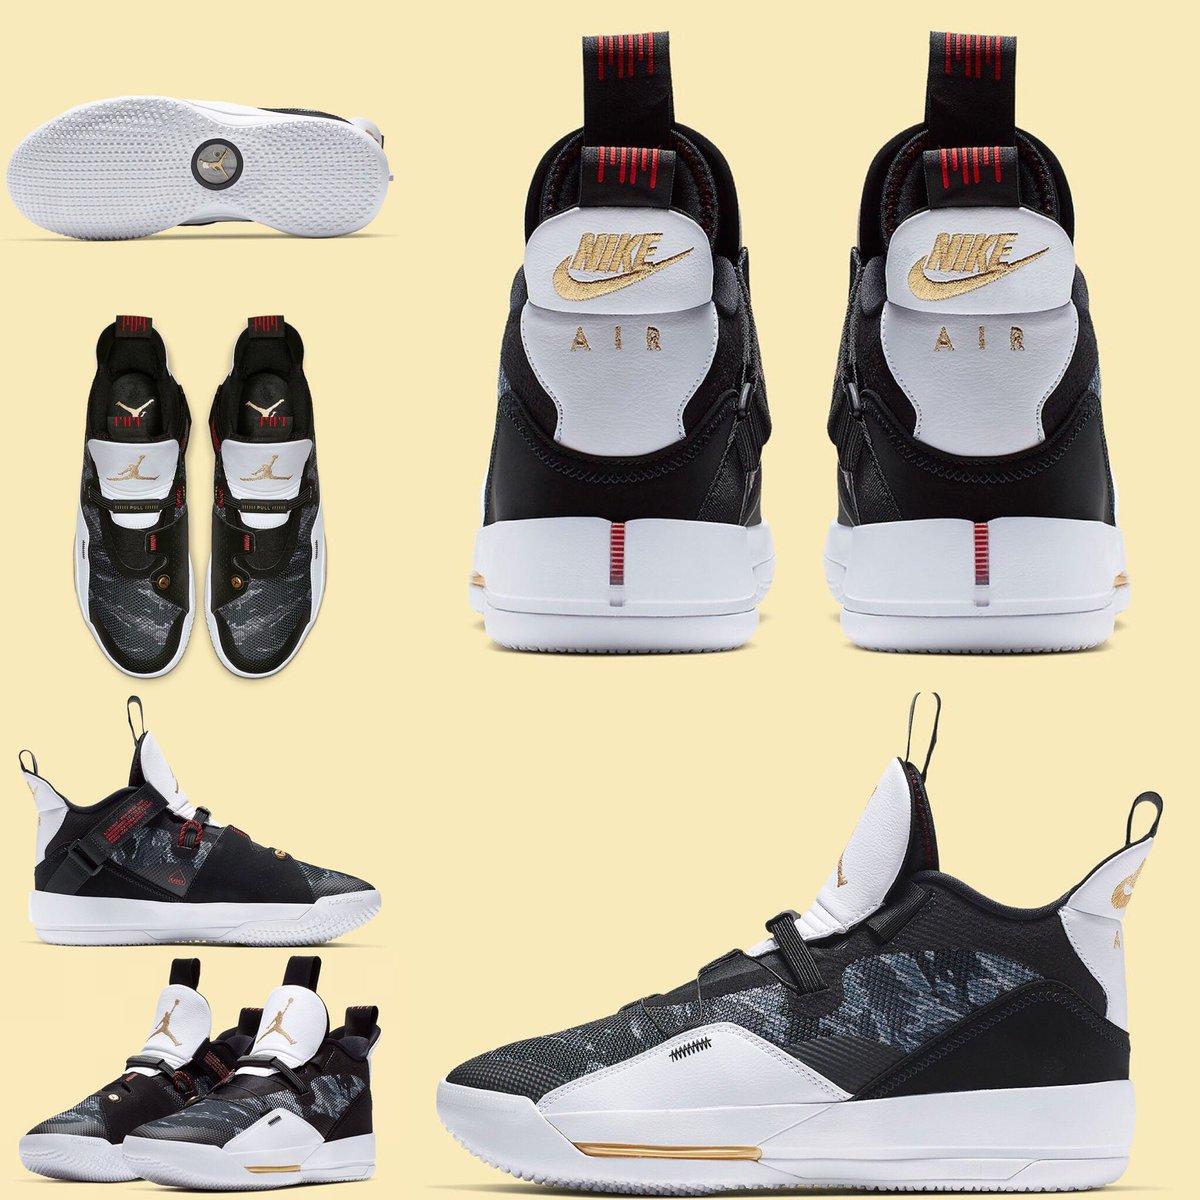 9878f1f1bc8 Jordan Adds A New Tiger Camo To The Air Jordan 33 #sneakerhead  #sneakersforlife #